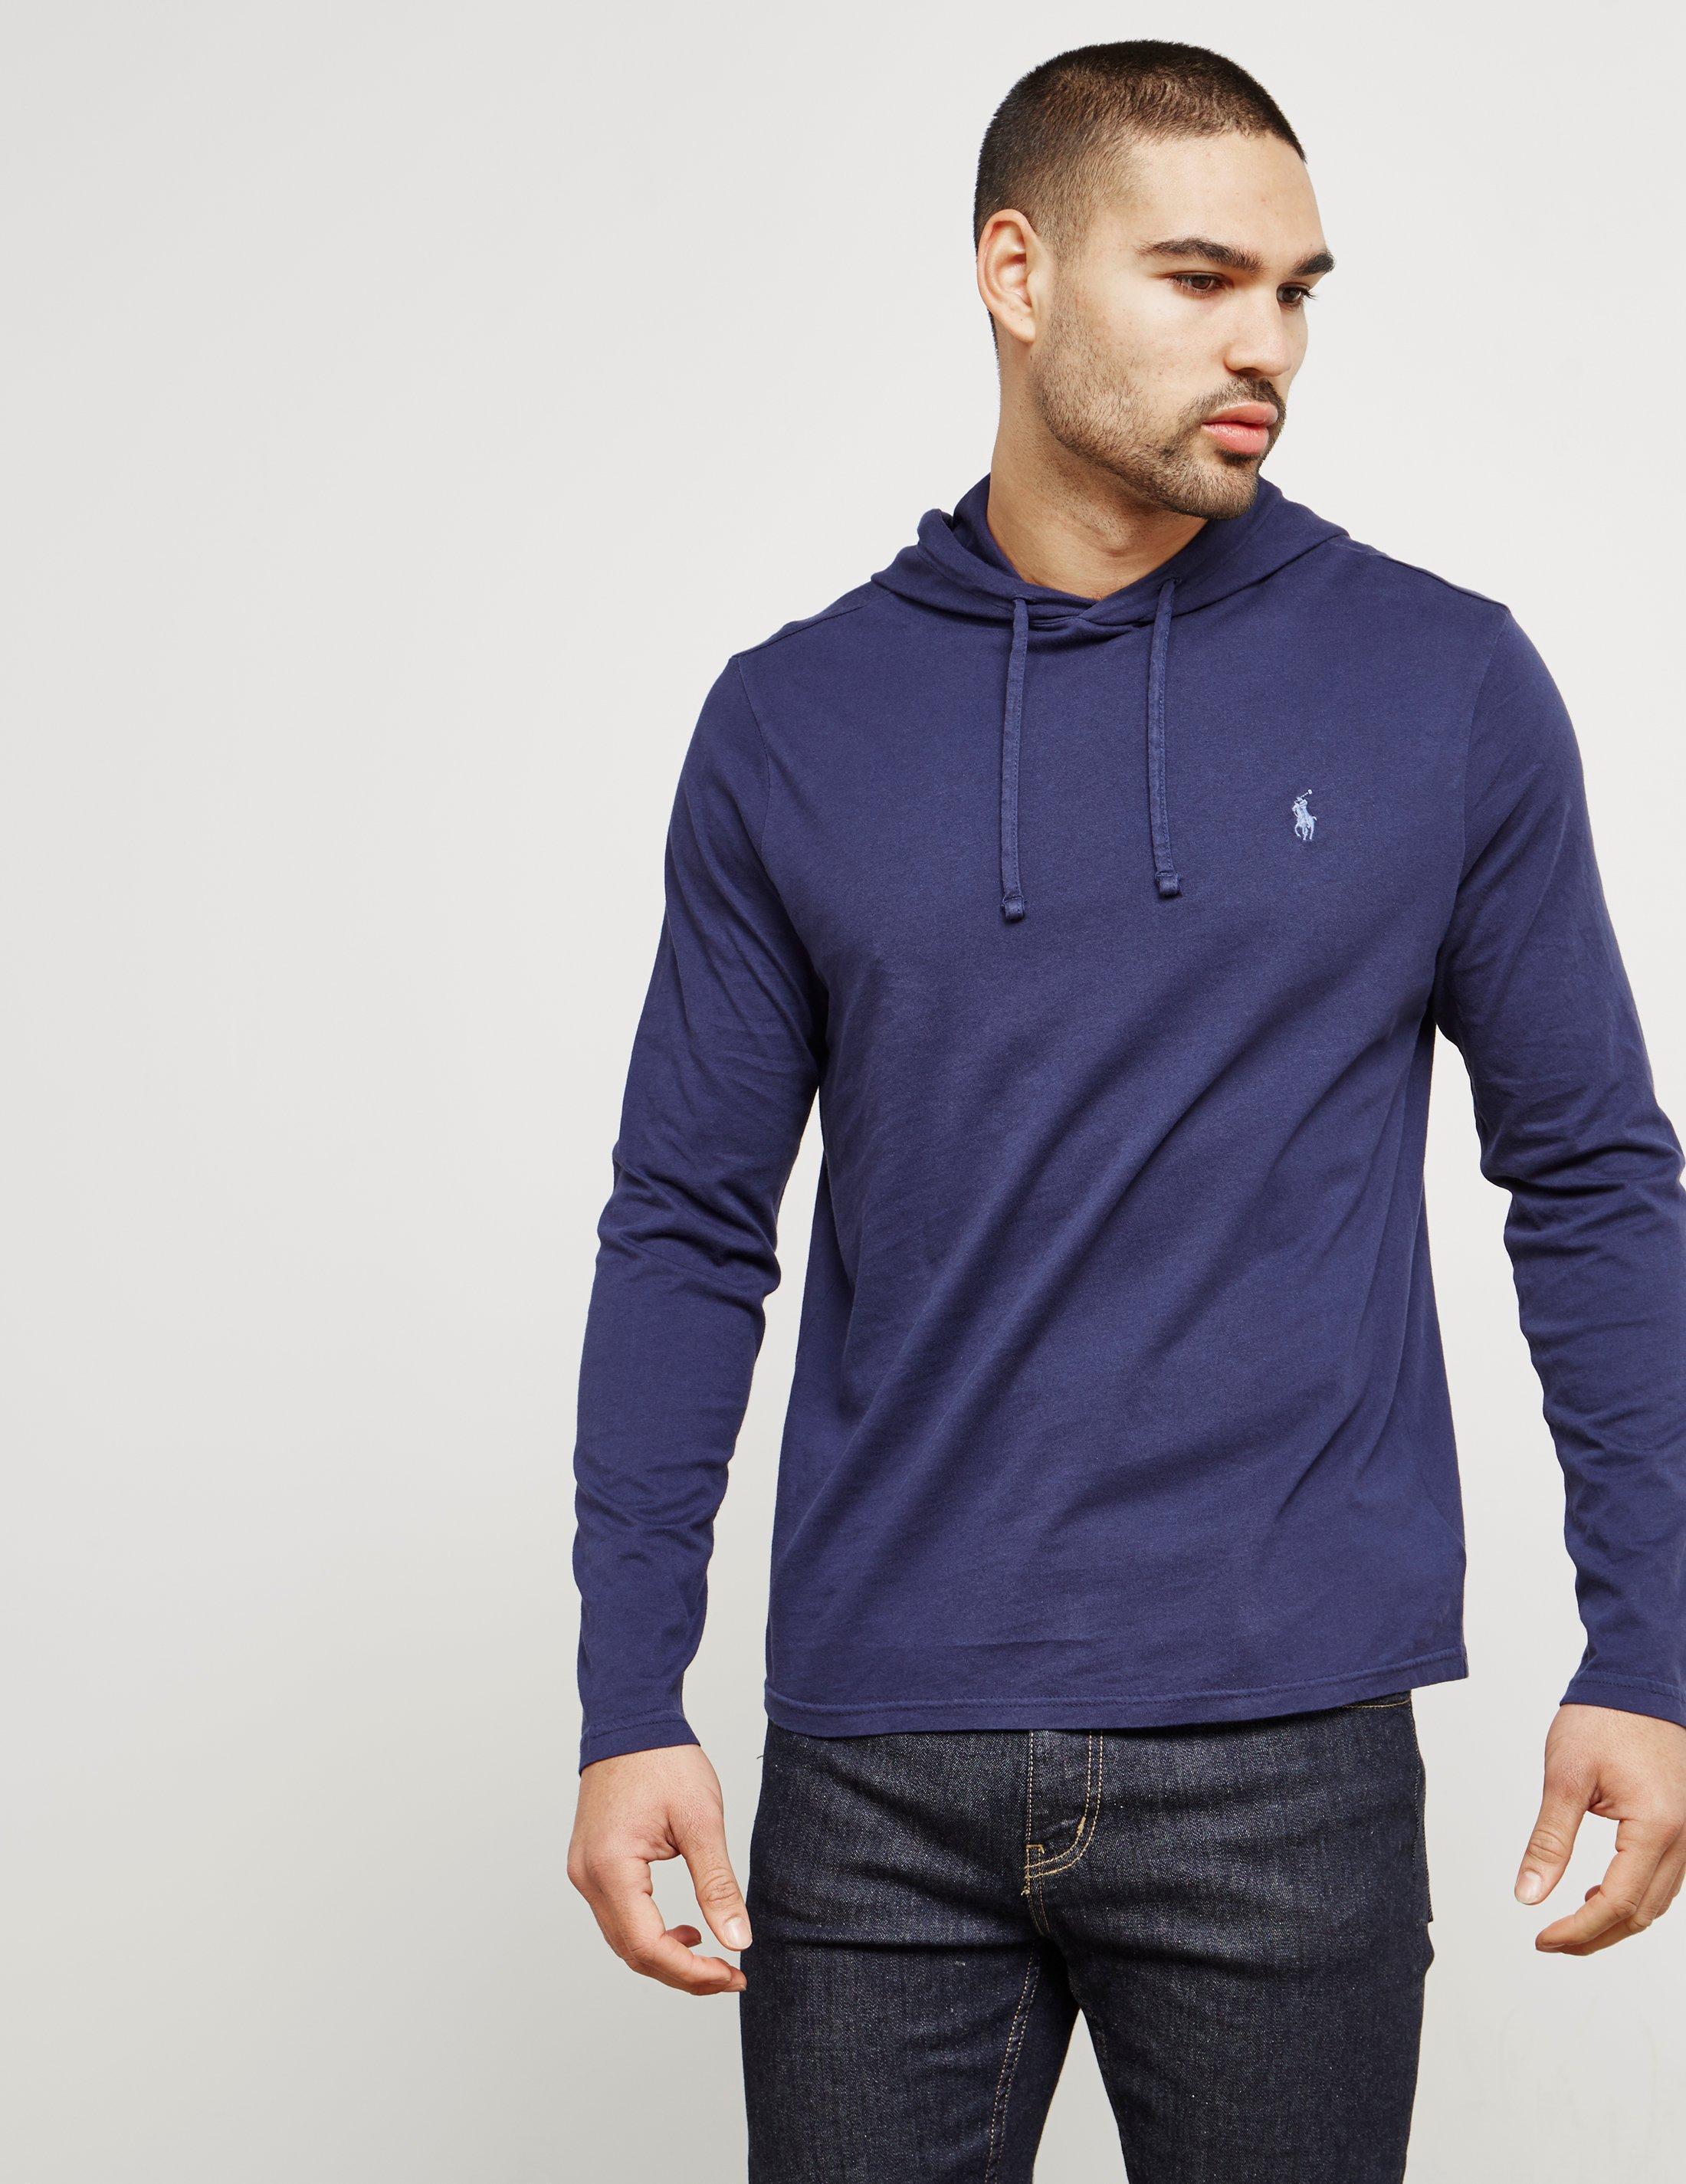 2b0554c58 Polo Ralph Lauren Mens Hooded Long Sleeve T-shirt Navy Blue in Blue ...